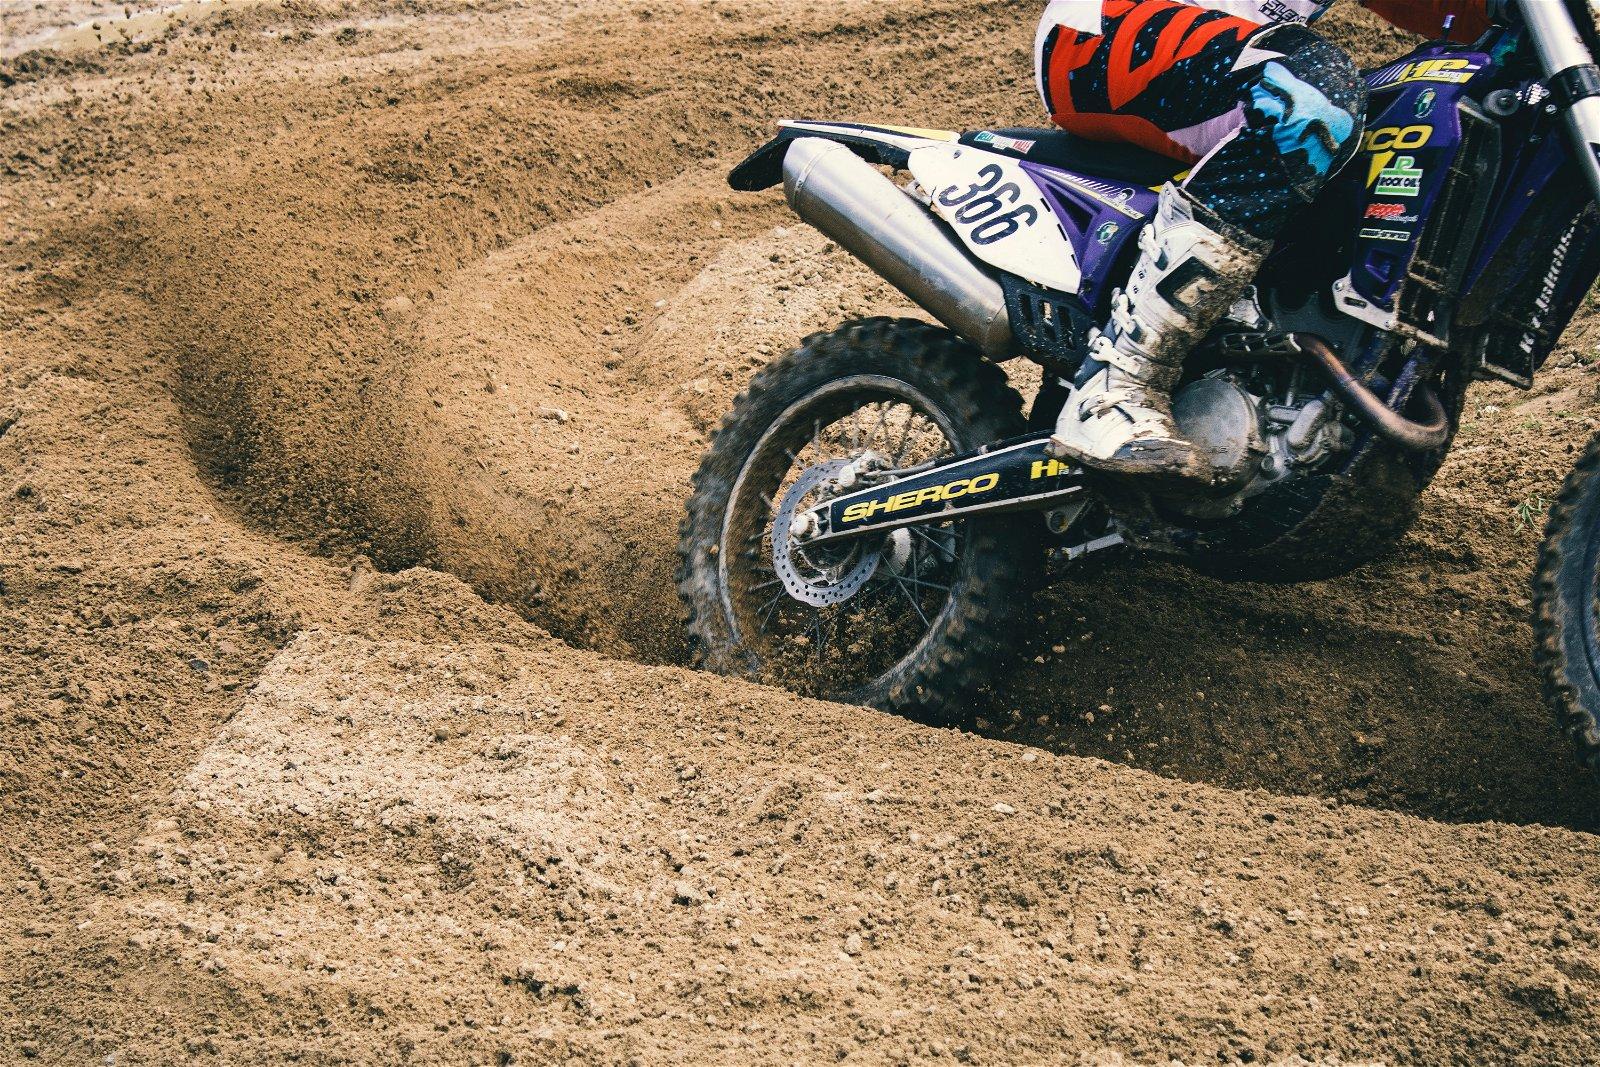 Close-up motorsport photography